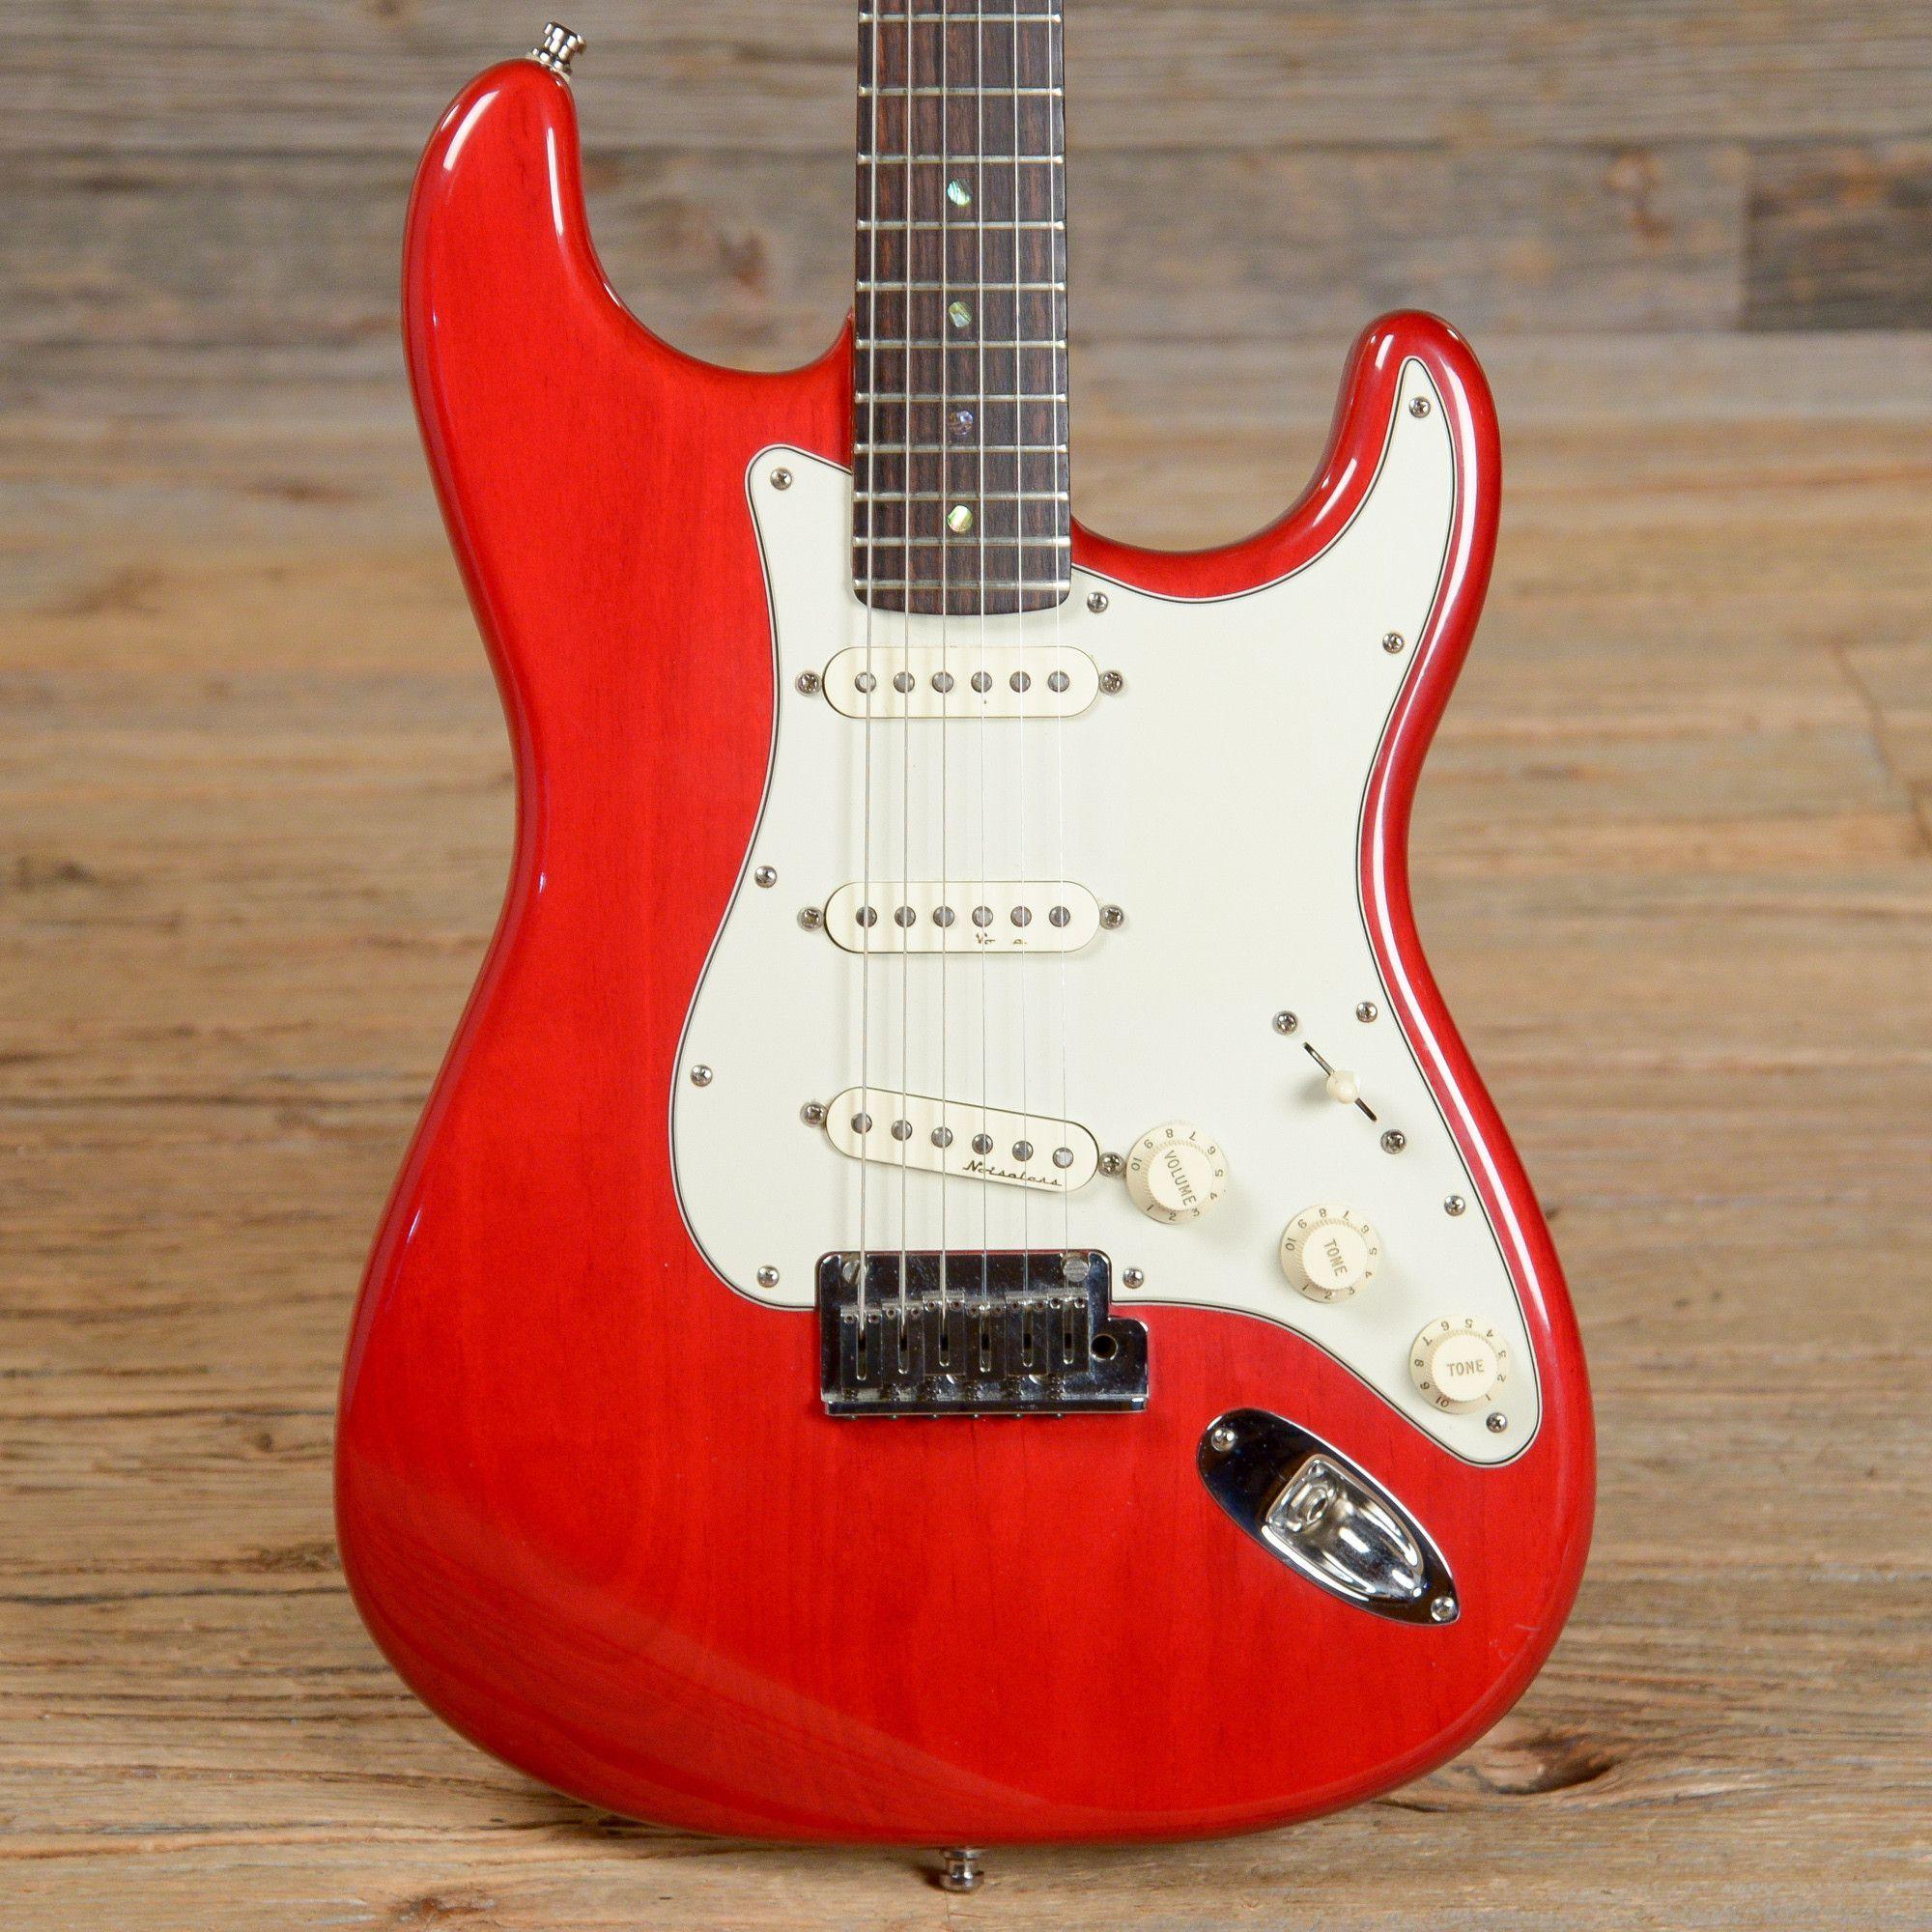 25 Best Ideas About Vintage Guitars On Pinterest